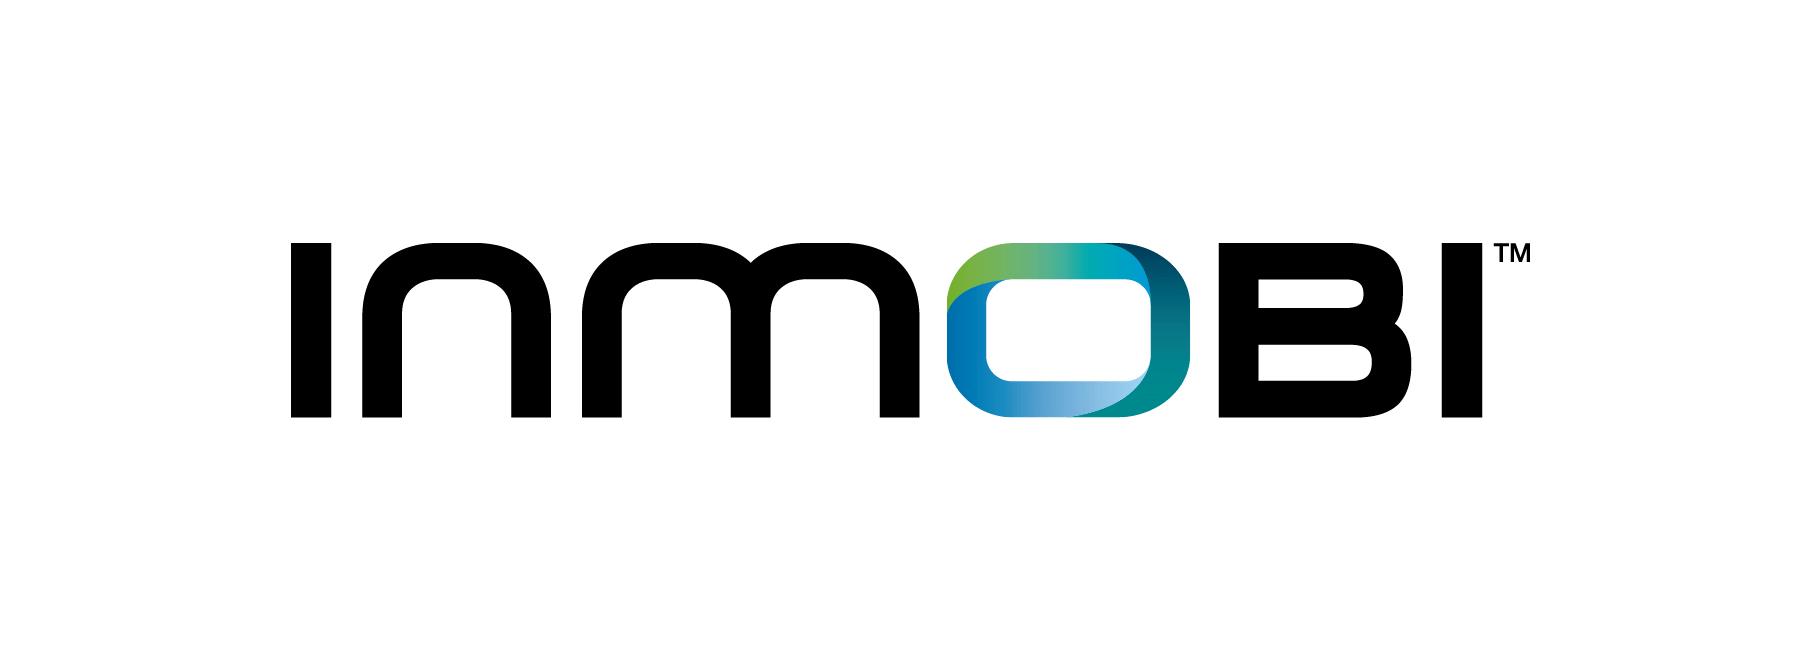 InMobi company logo